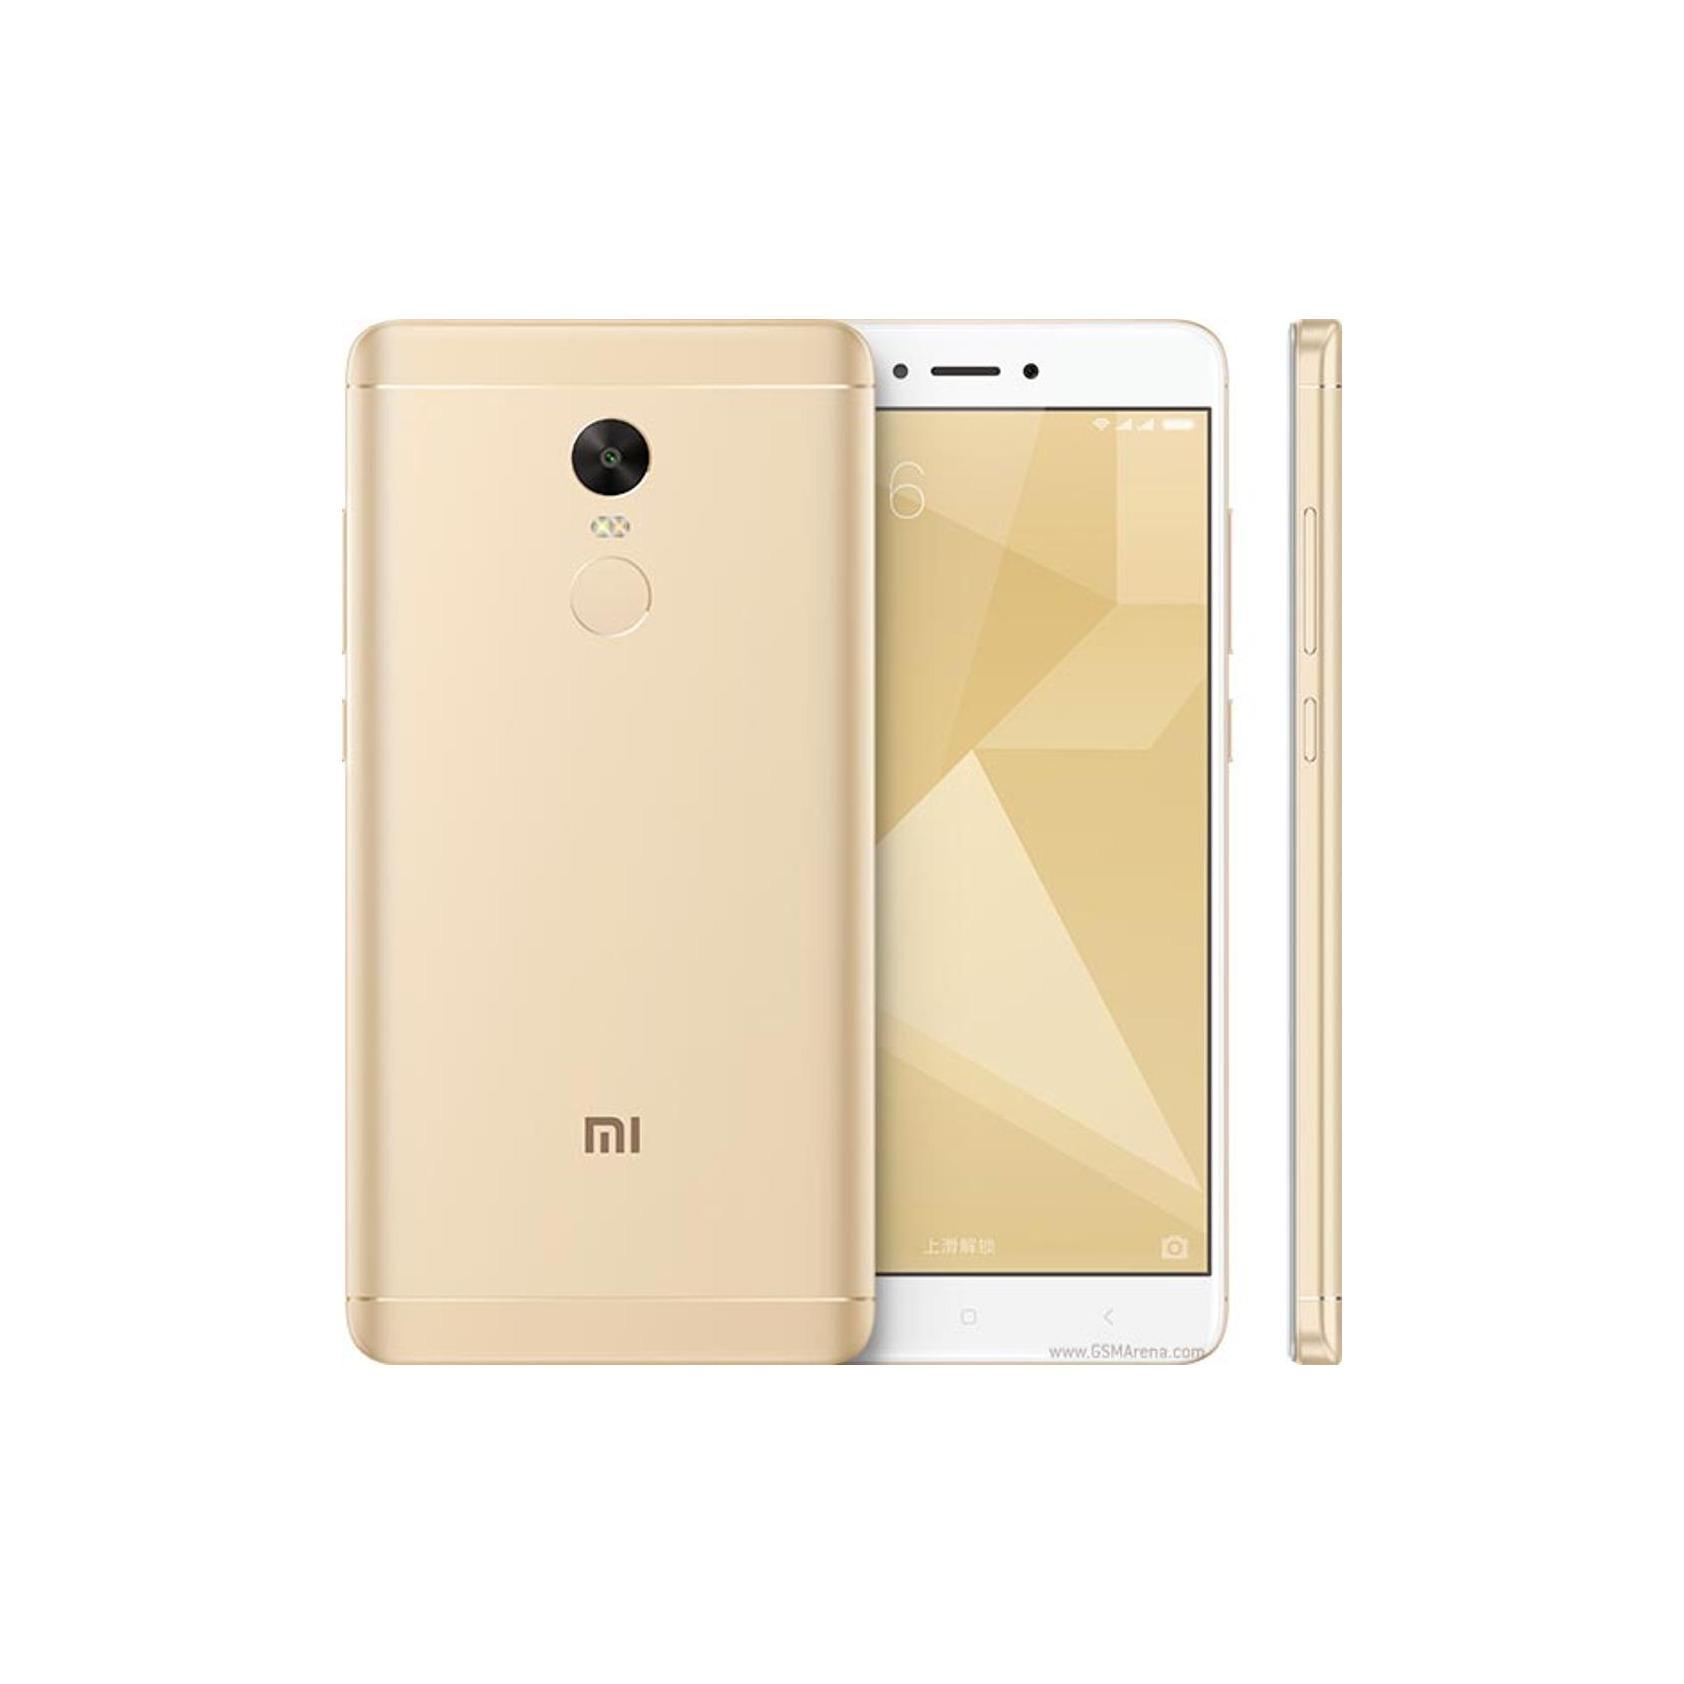 Harga Xiaomi Mi4s Ram 3gb Internal 64gb Lengkap Dan Redmi 5a Prime Grey 2gb 32gb Garansi Distributor 1thn Note 4x Warna Gold